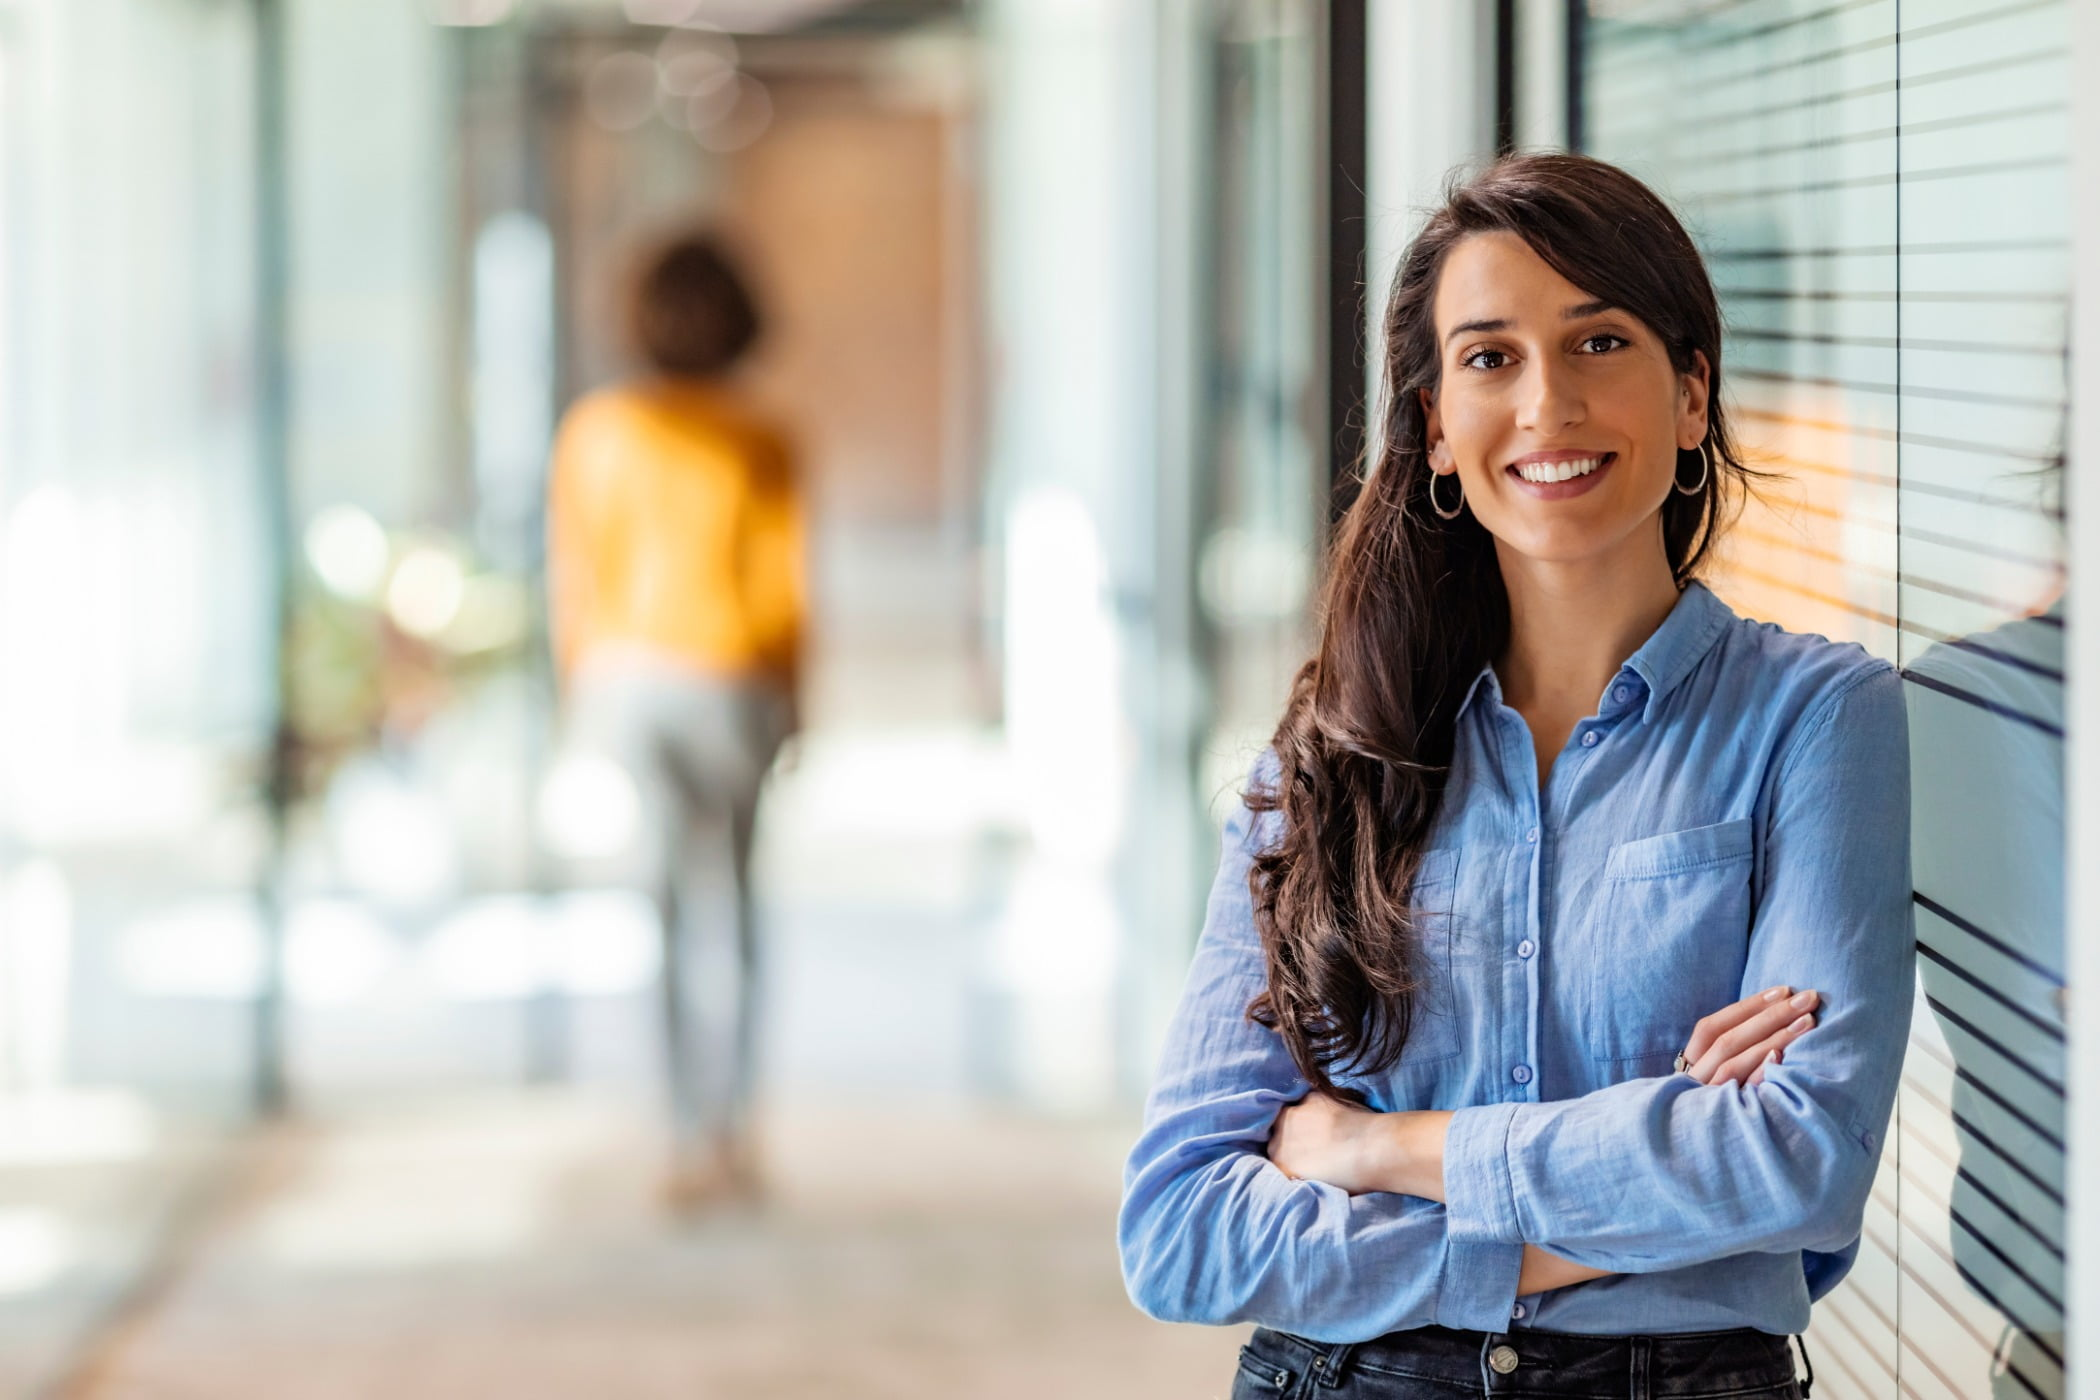 Confident businesswoman smiling to camera.